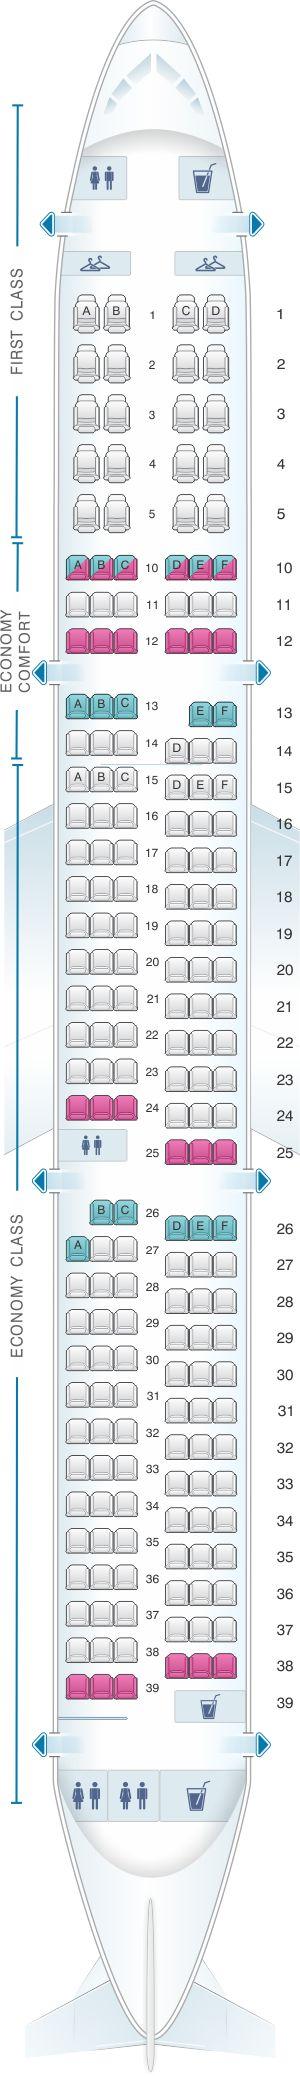 Pinterestteki Den Fazla En Iyi Airbus A Seating Chart Fikri - Us airways a321 seat map